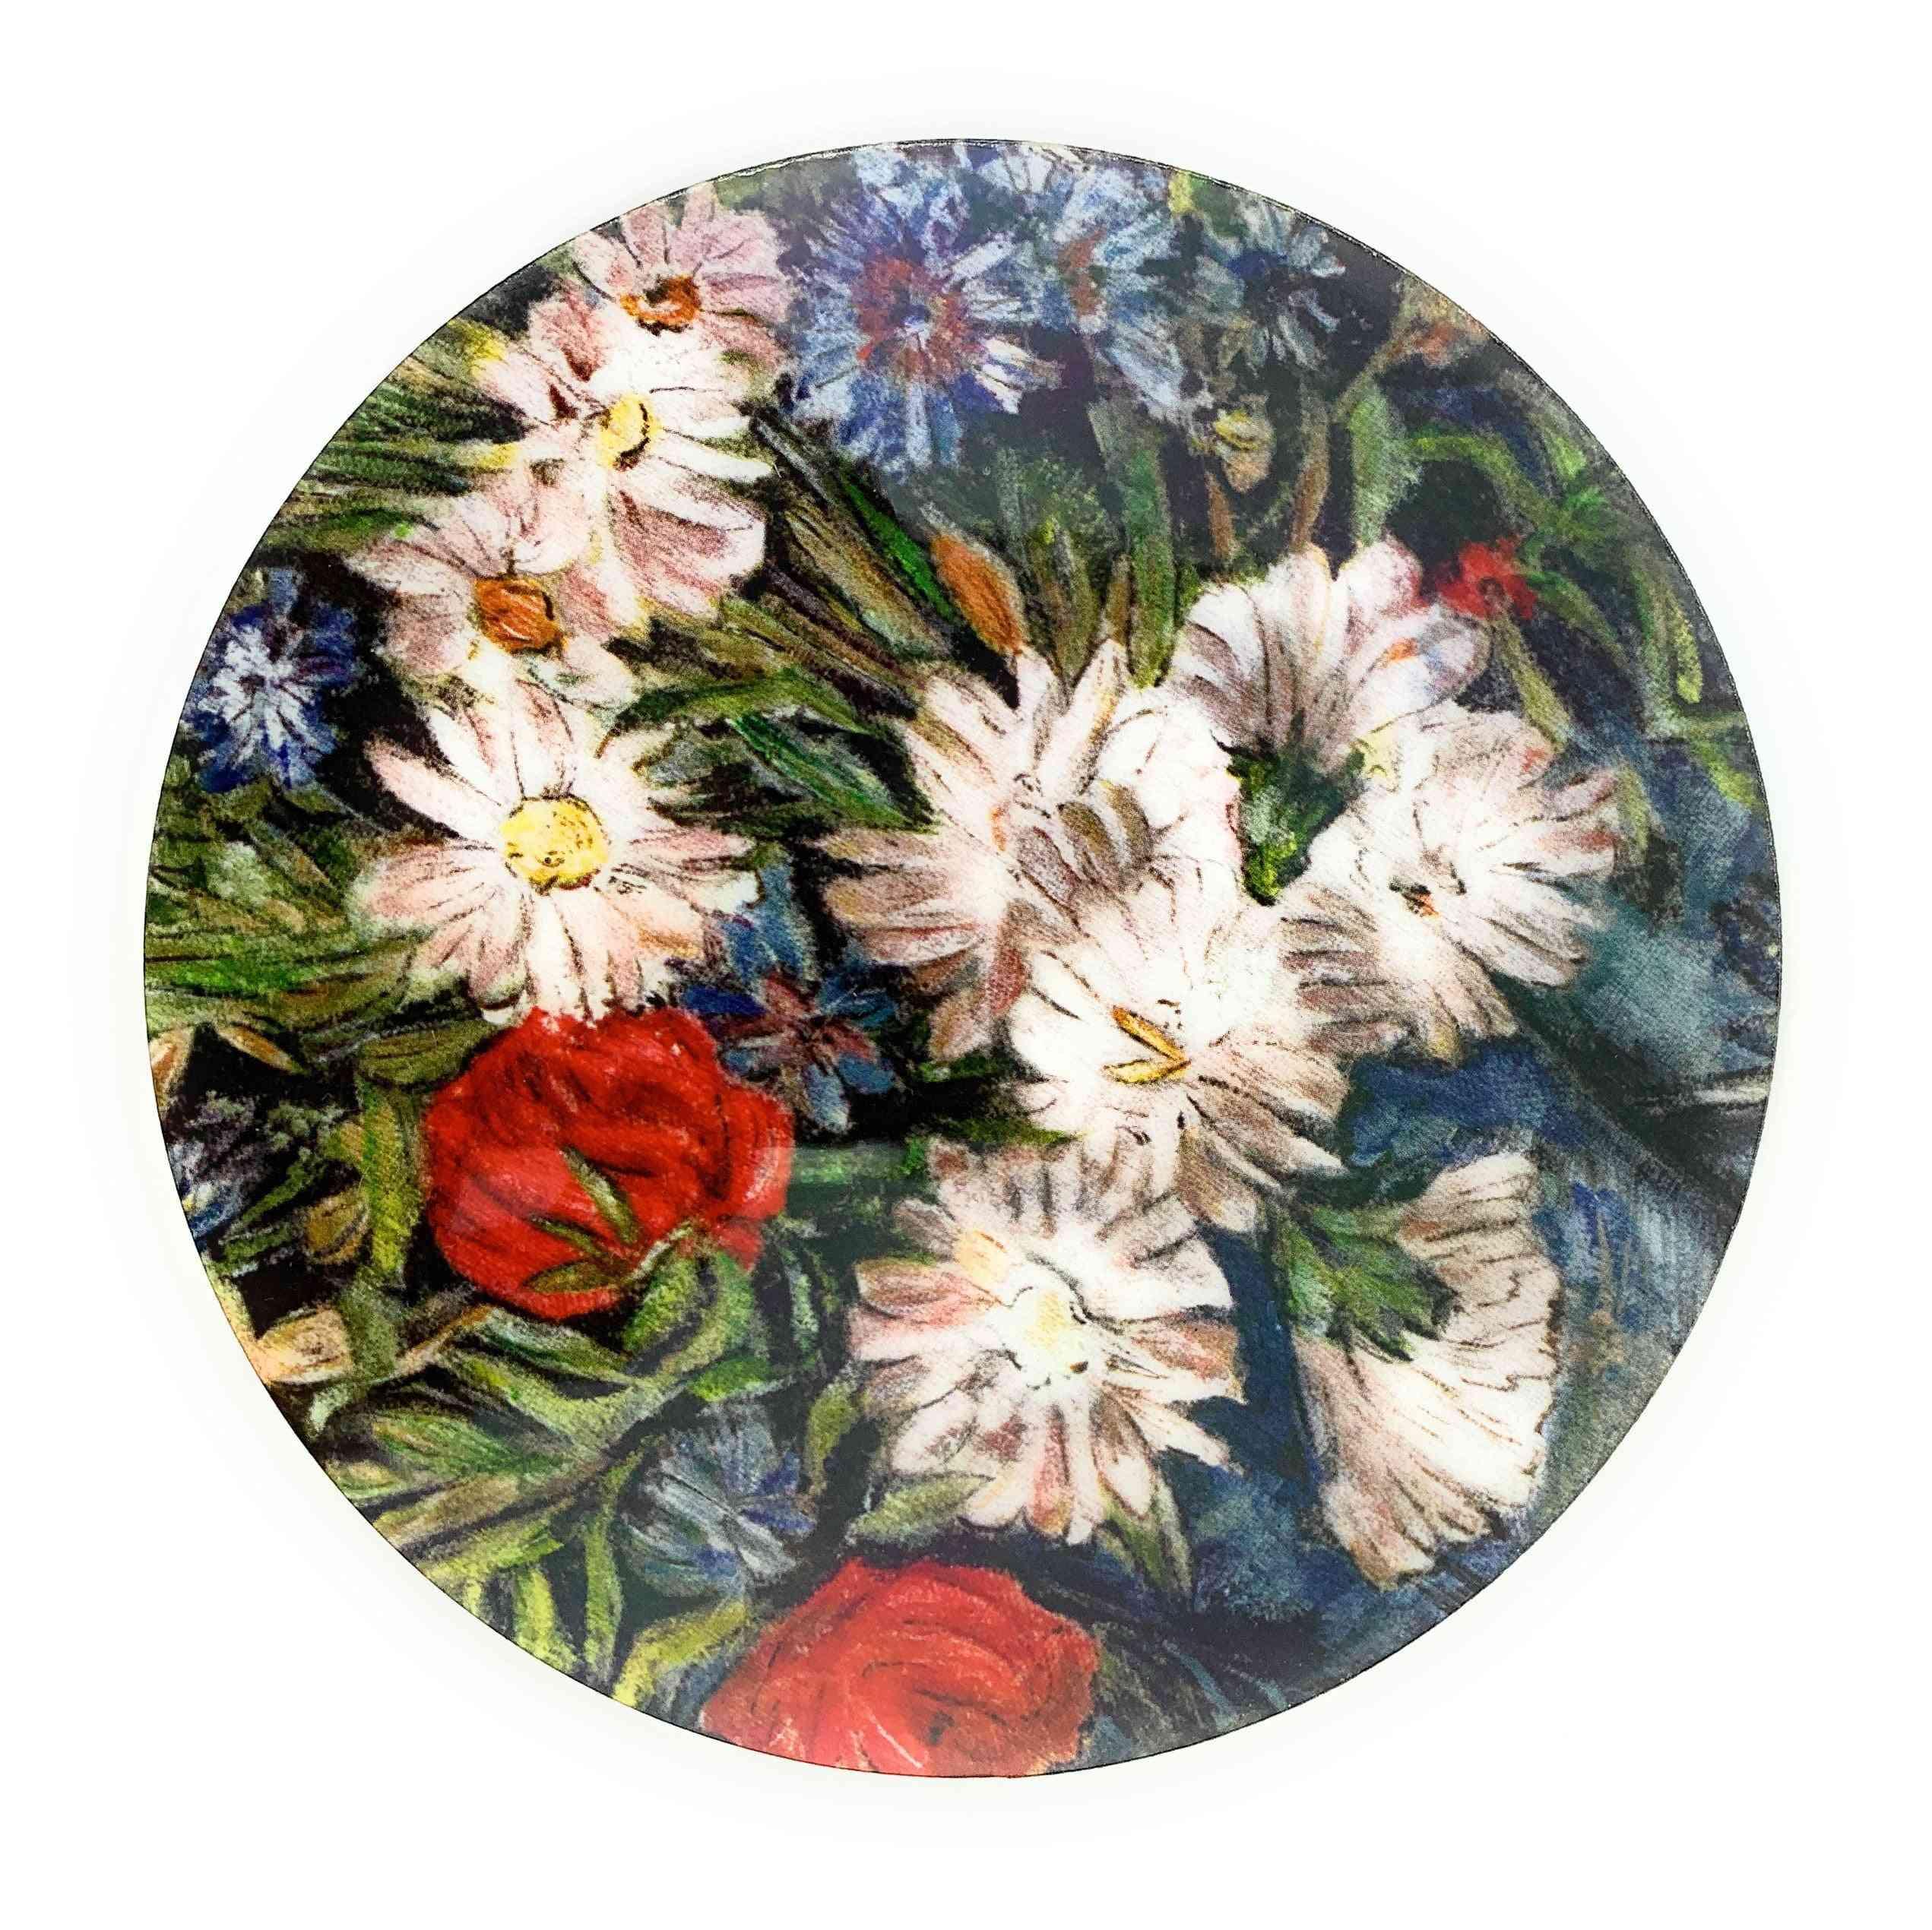 Vintage Spring Delight Coaster For Table Decor